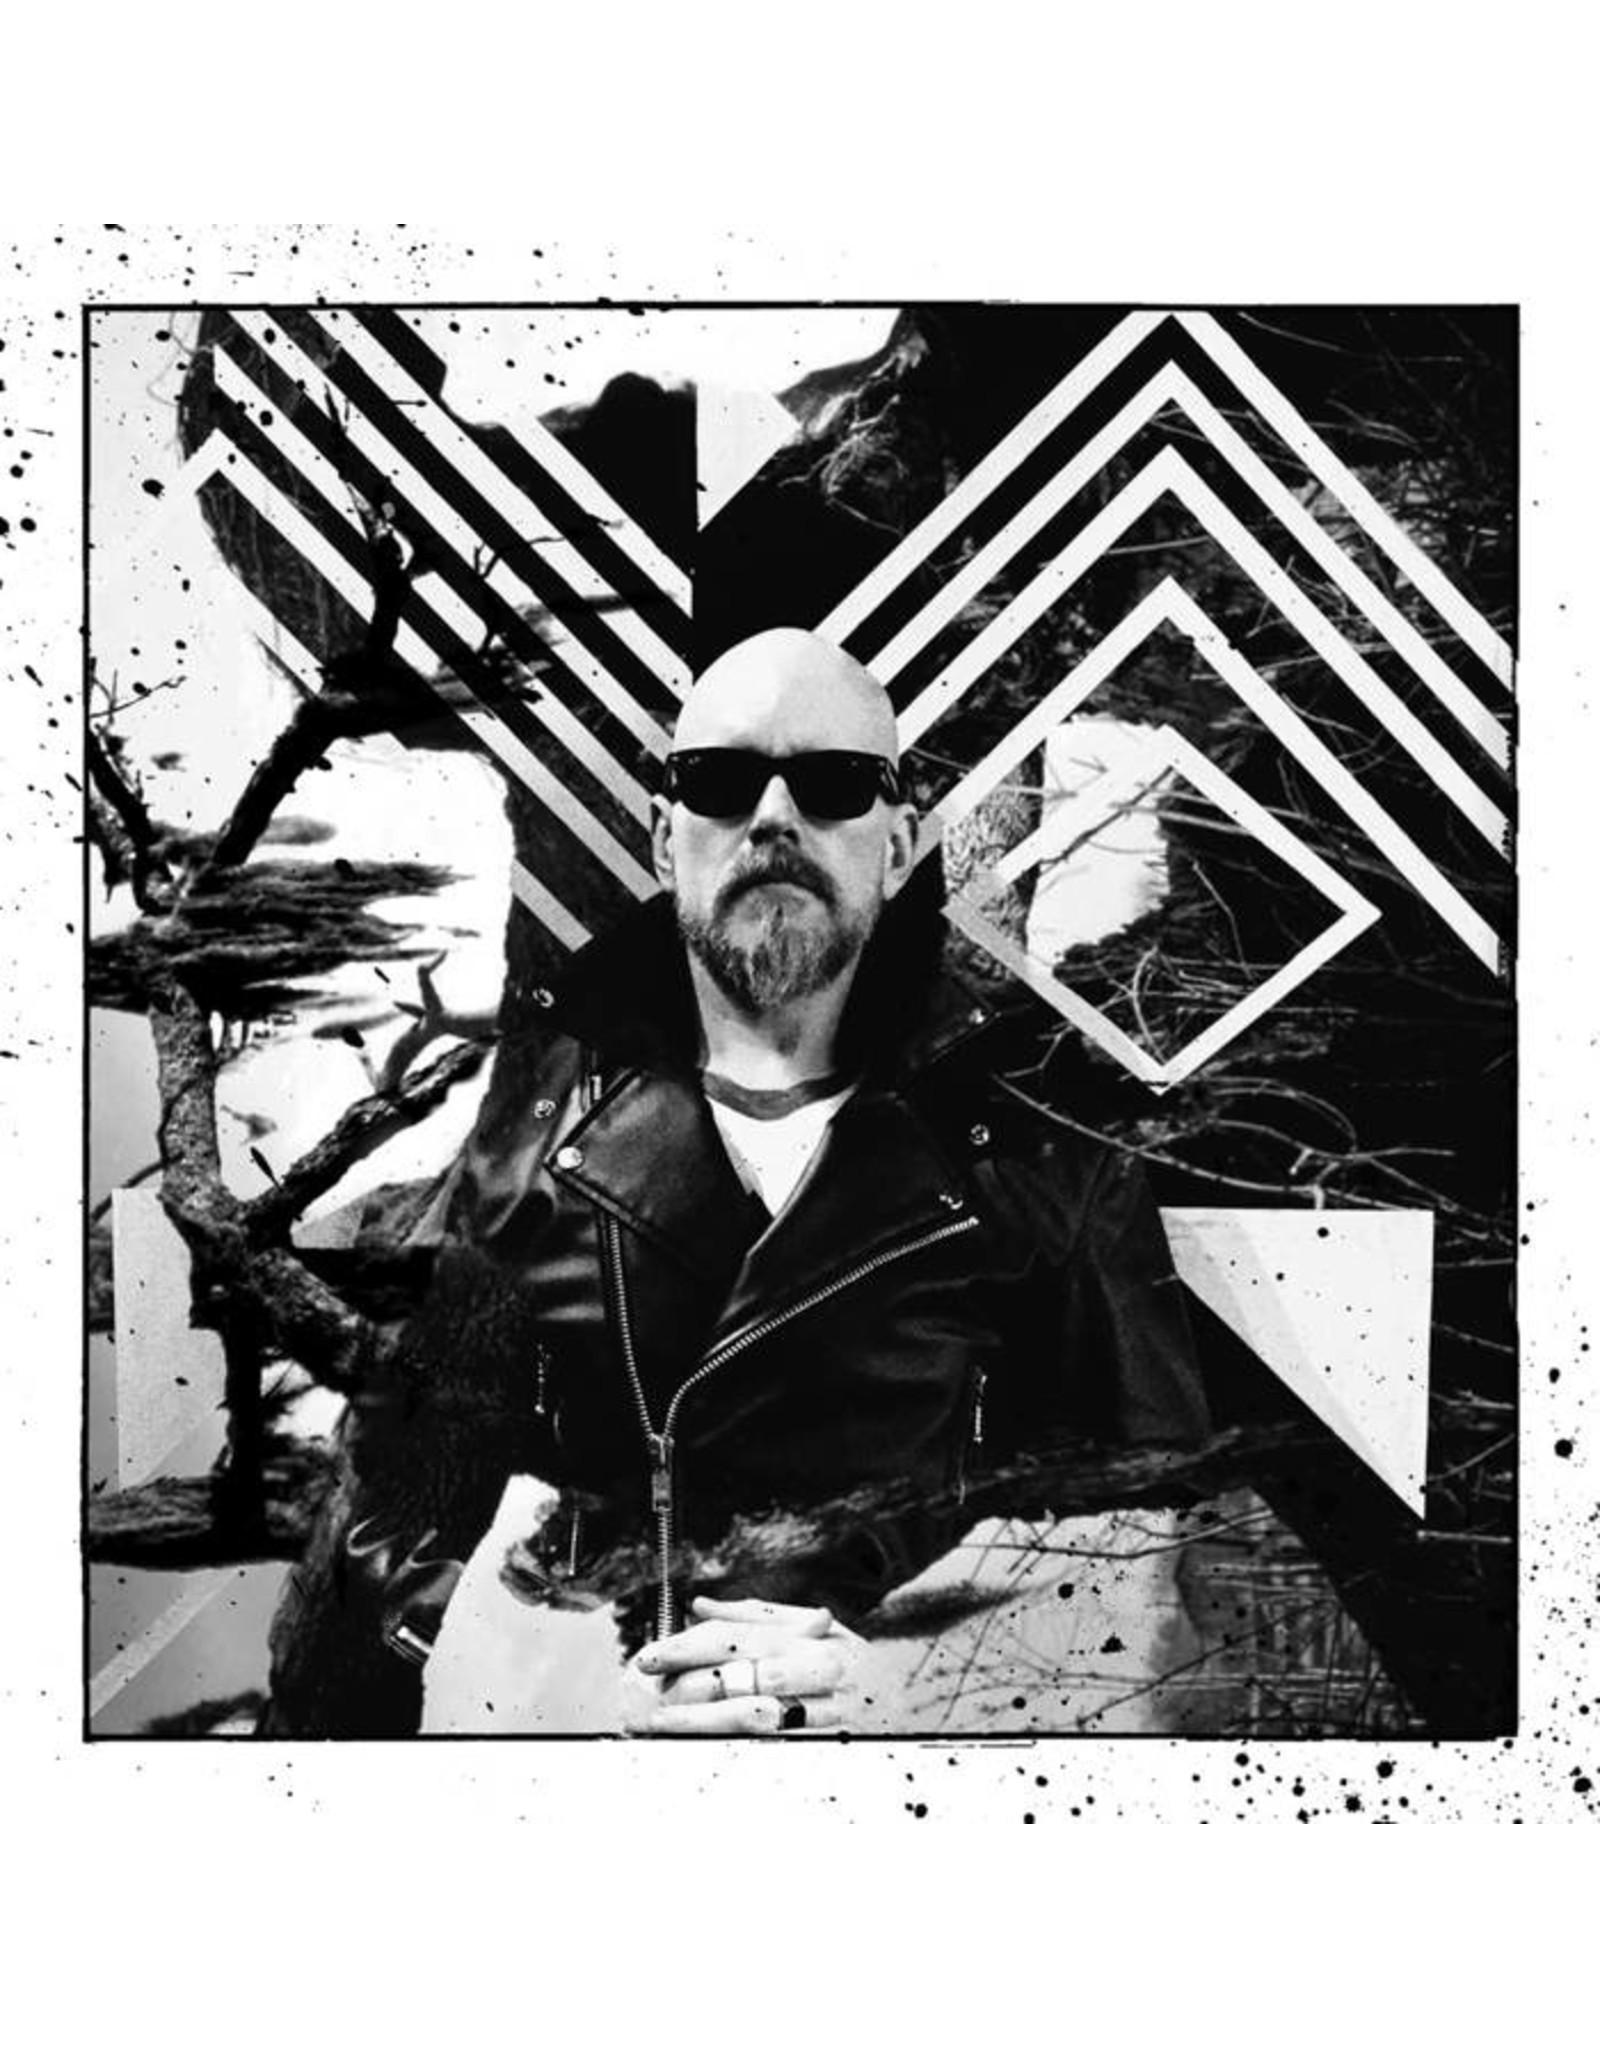 New Vinyl Fotocrime - South Of Heaven LP